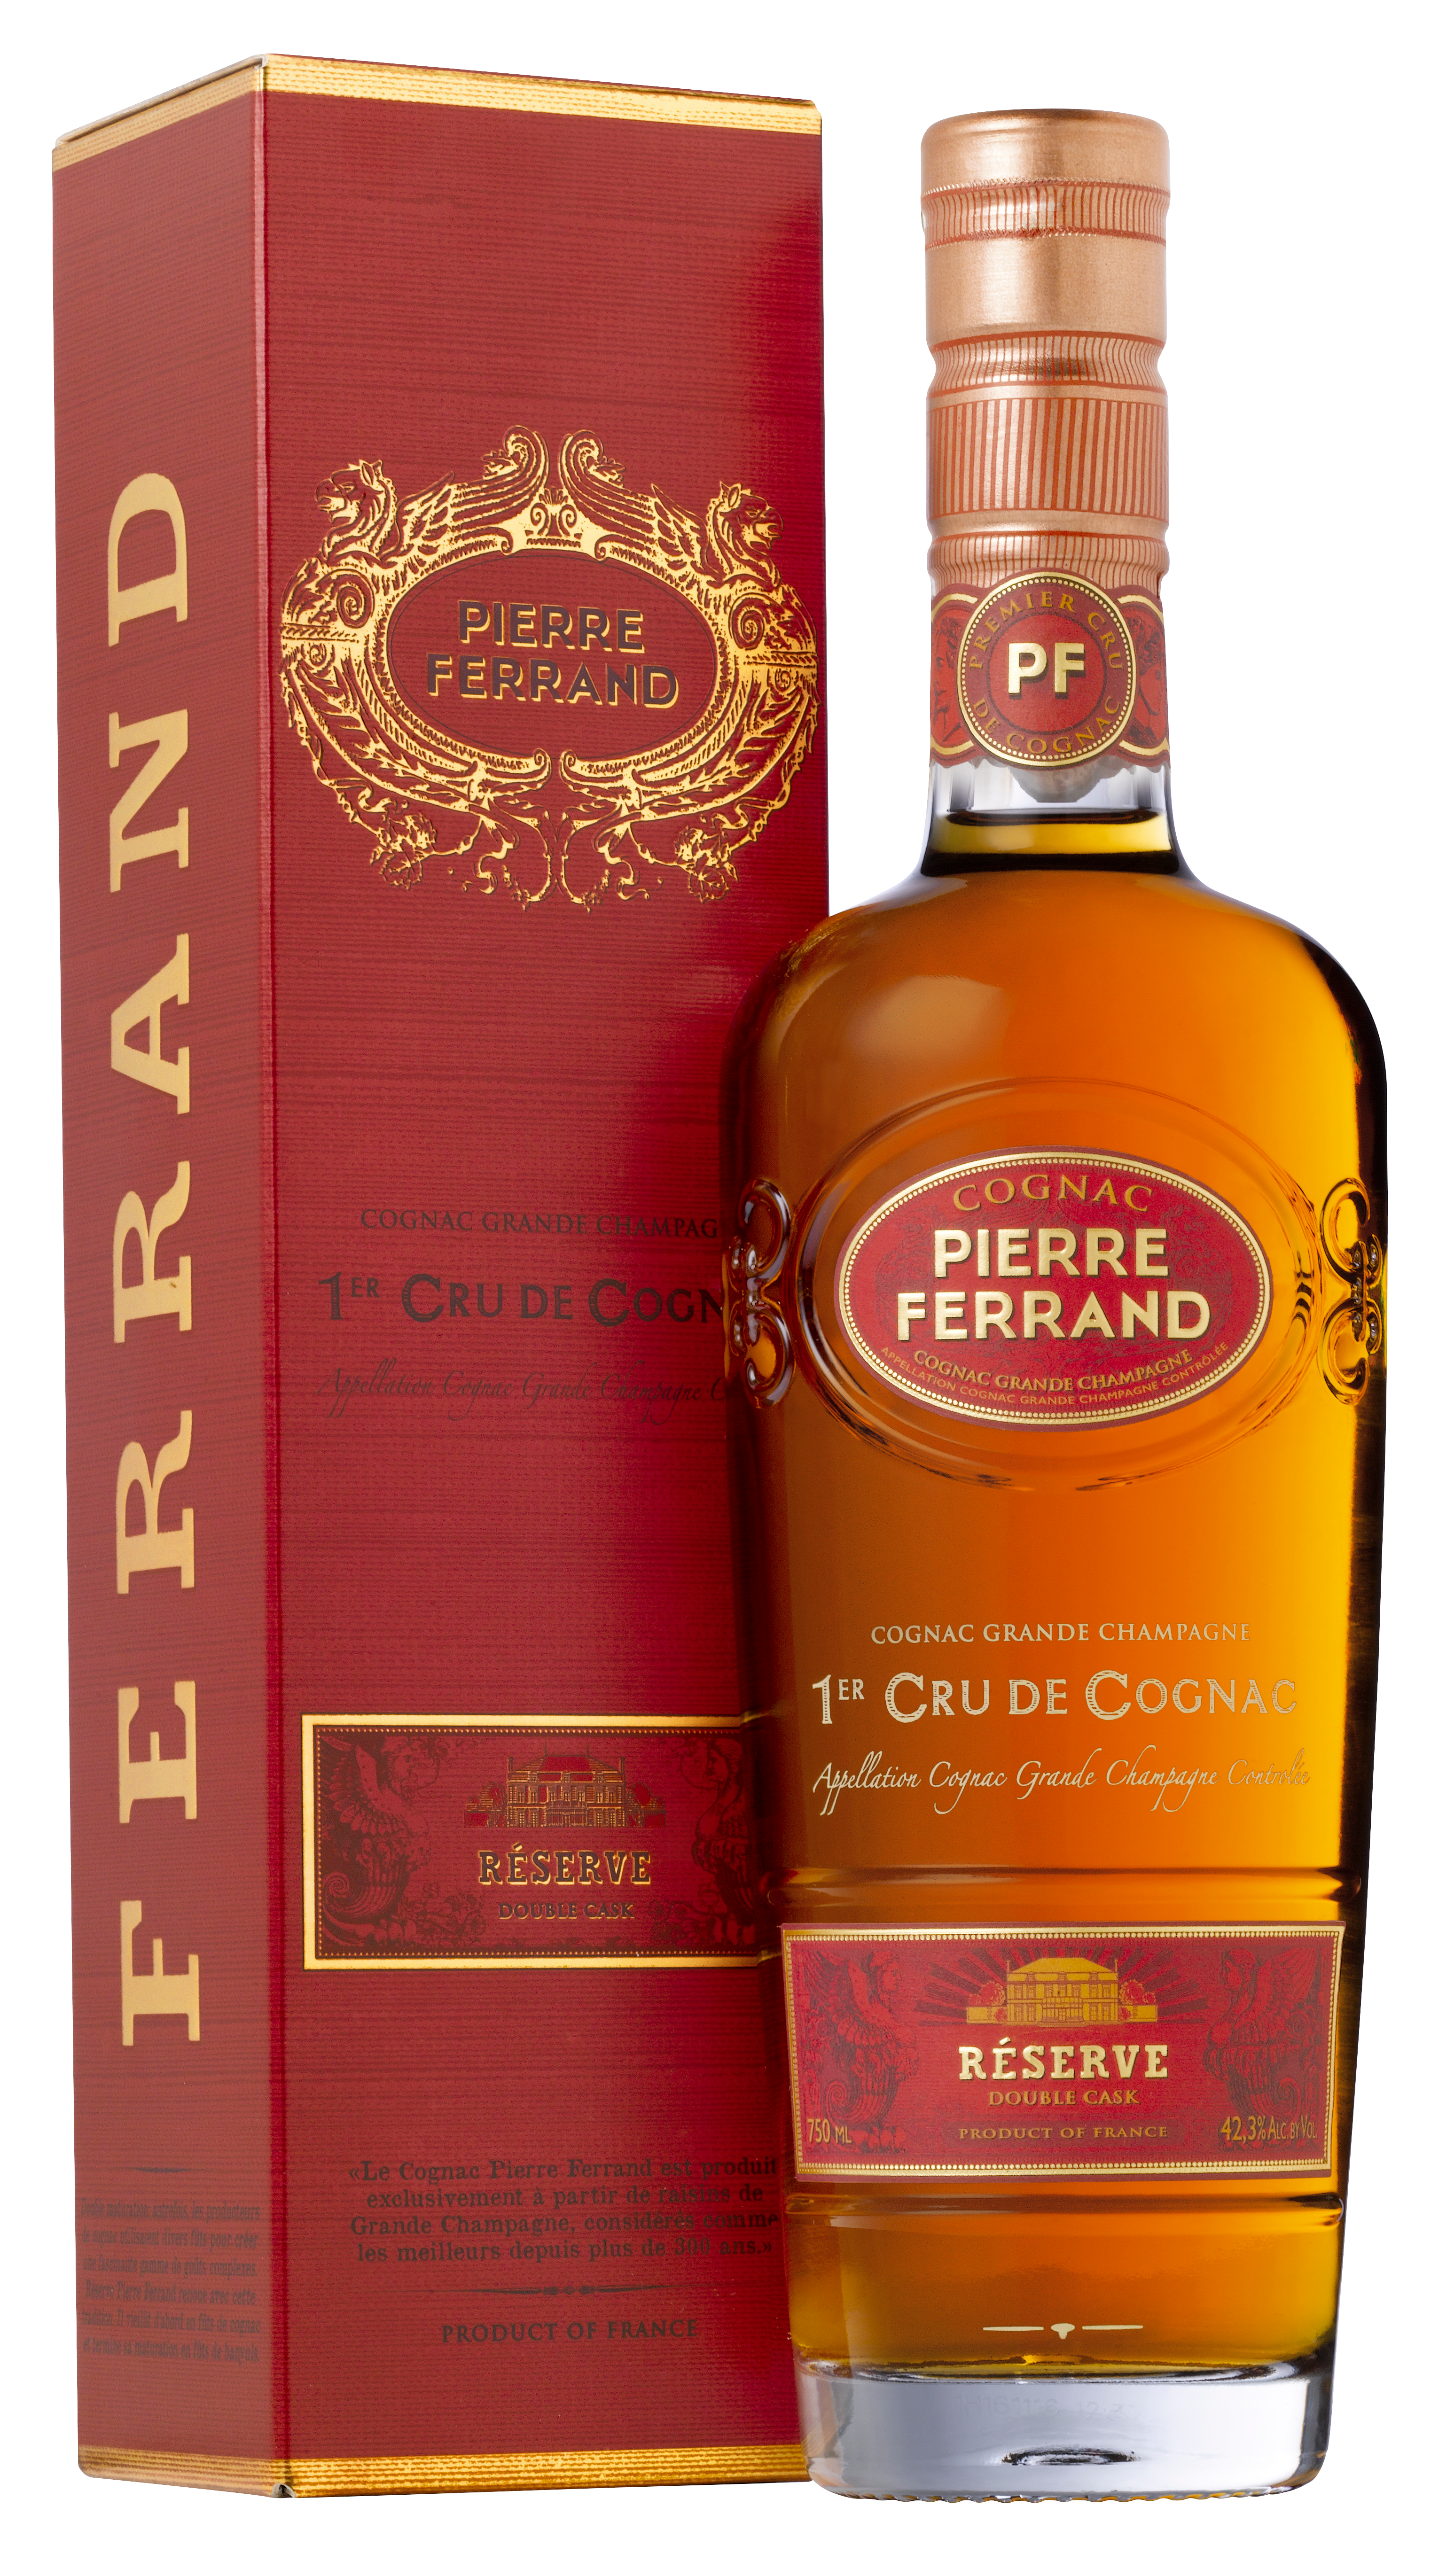 Pierre ferrand reserve 750ml coffret rvb 2681902ec9d